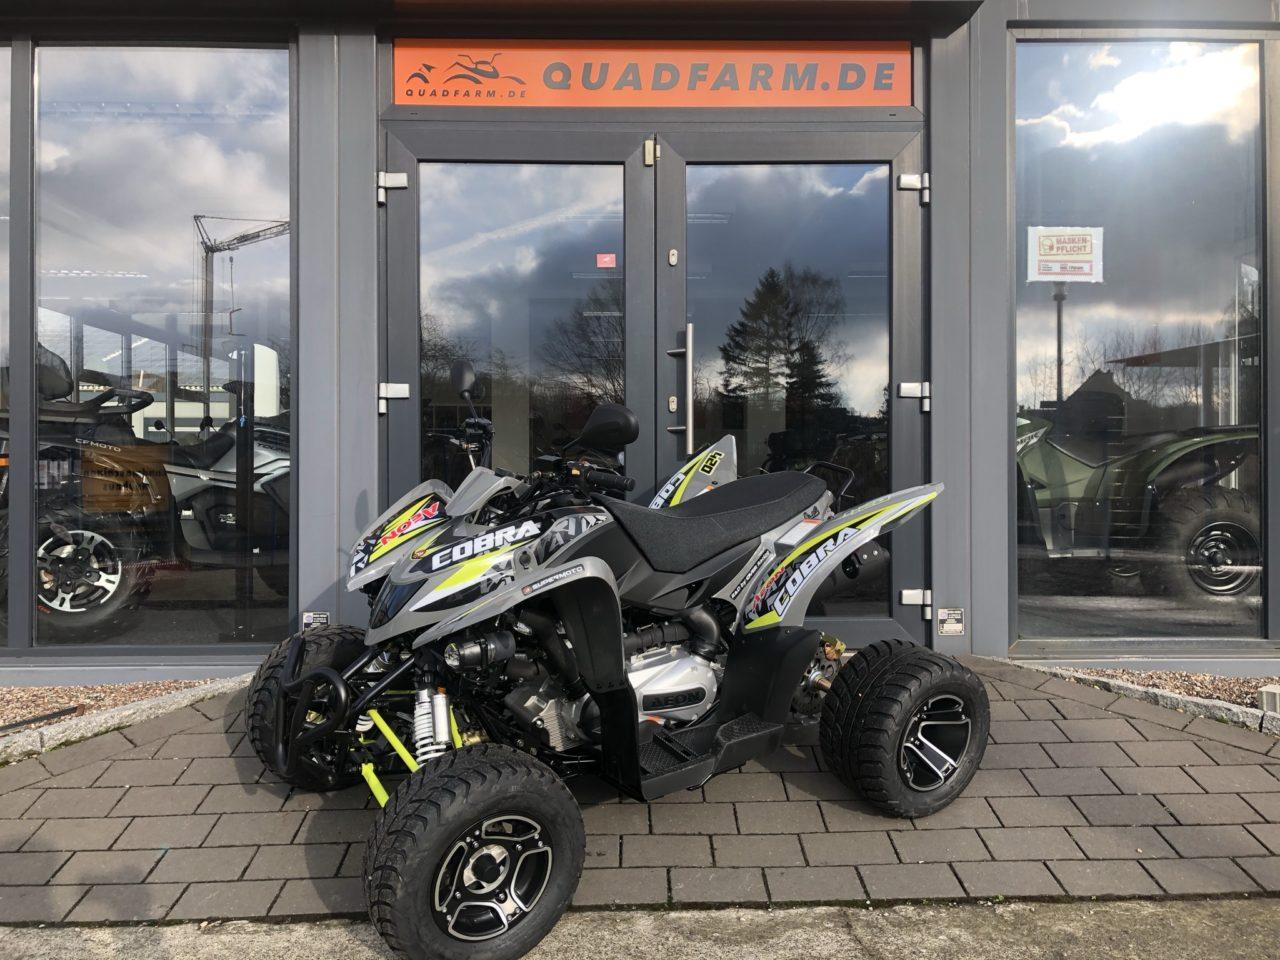 ATV / Quad Aeon Cobra 420 SM , 27 PS, 346 ccm, LOF